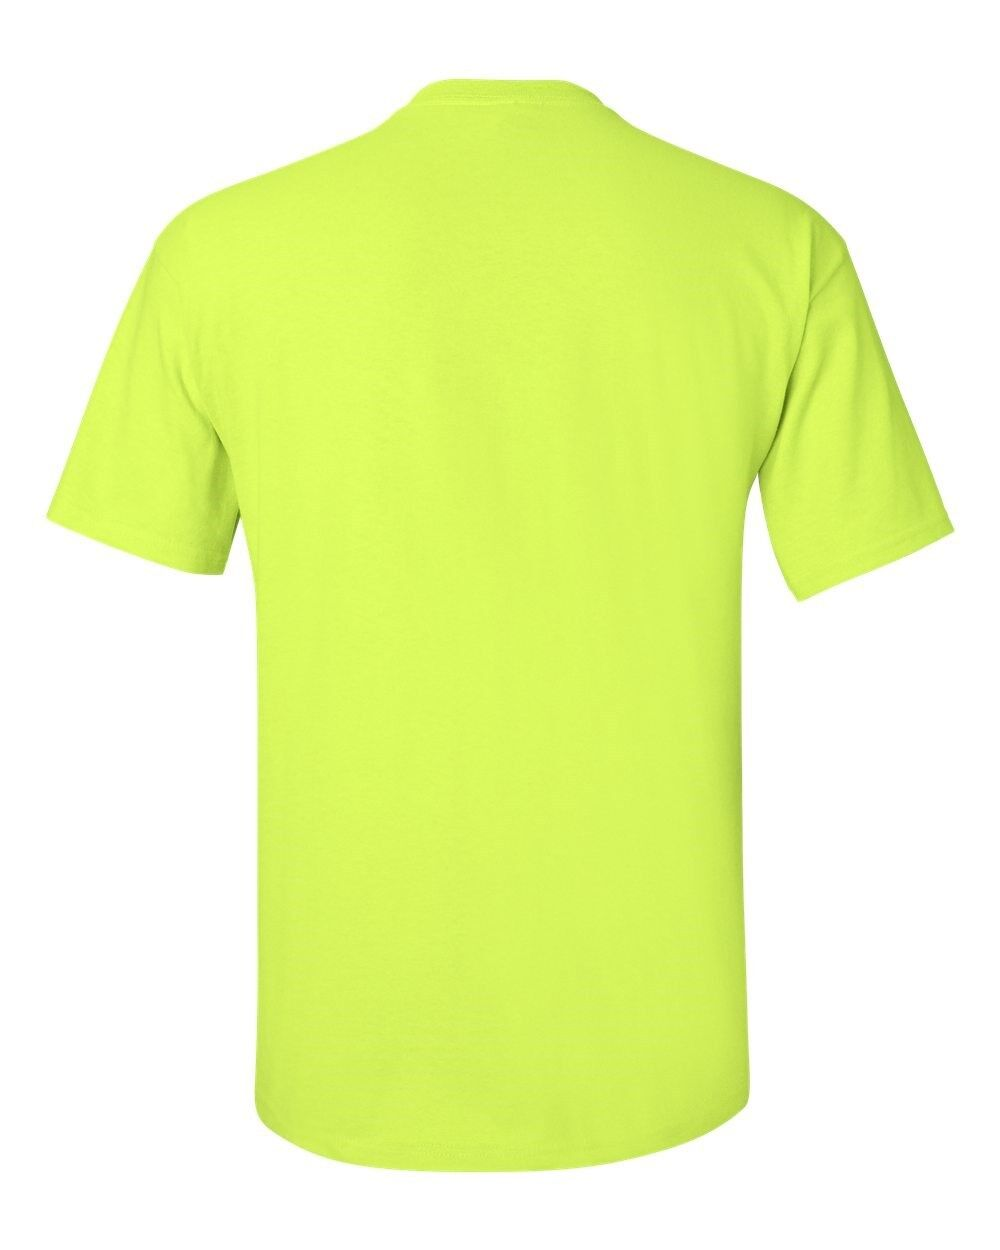 Hanes Big Tall T Shirts